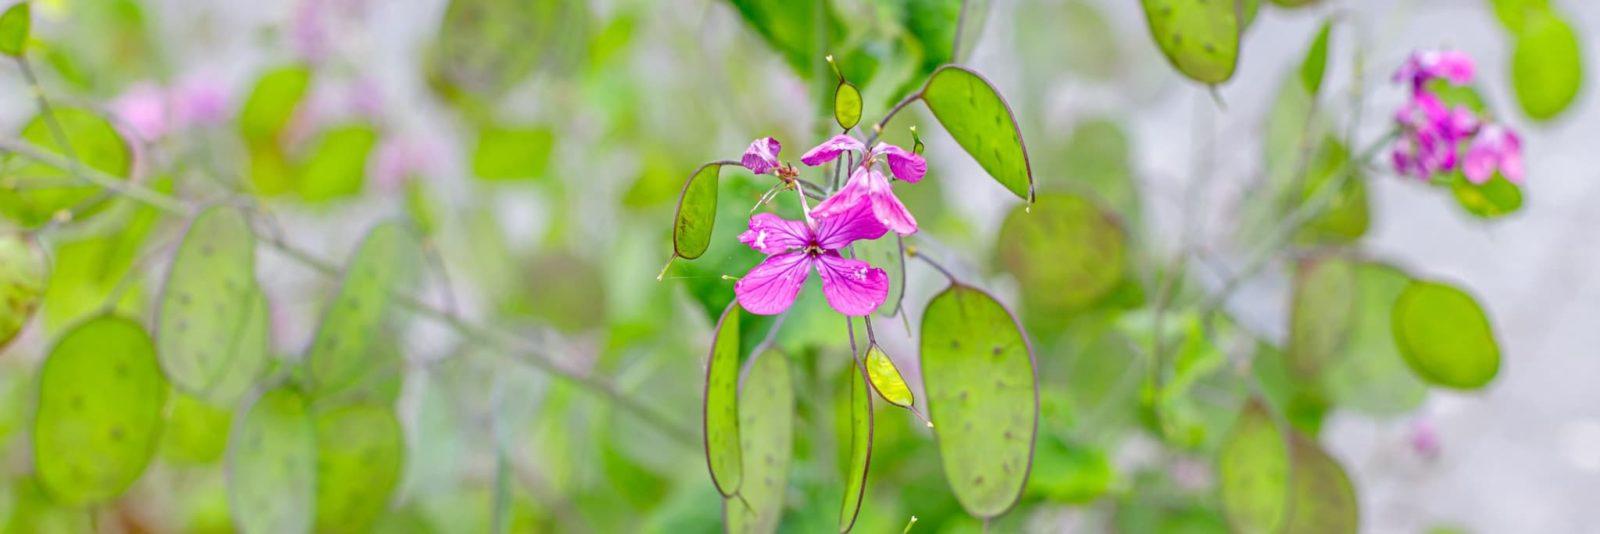 pink lunaria plant